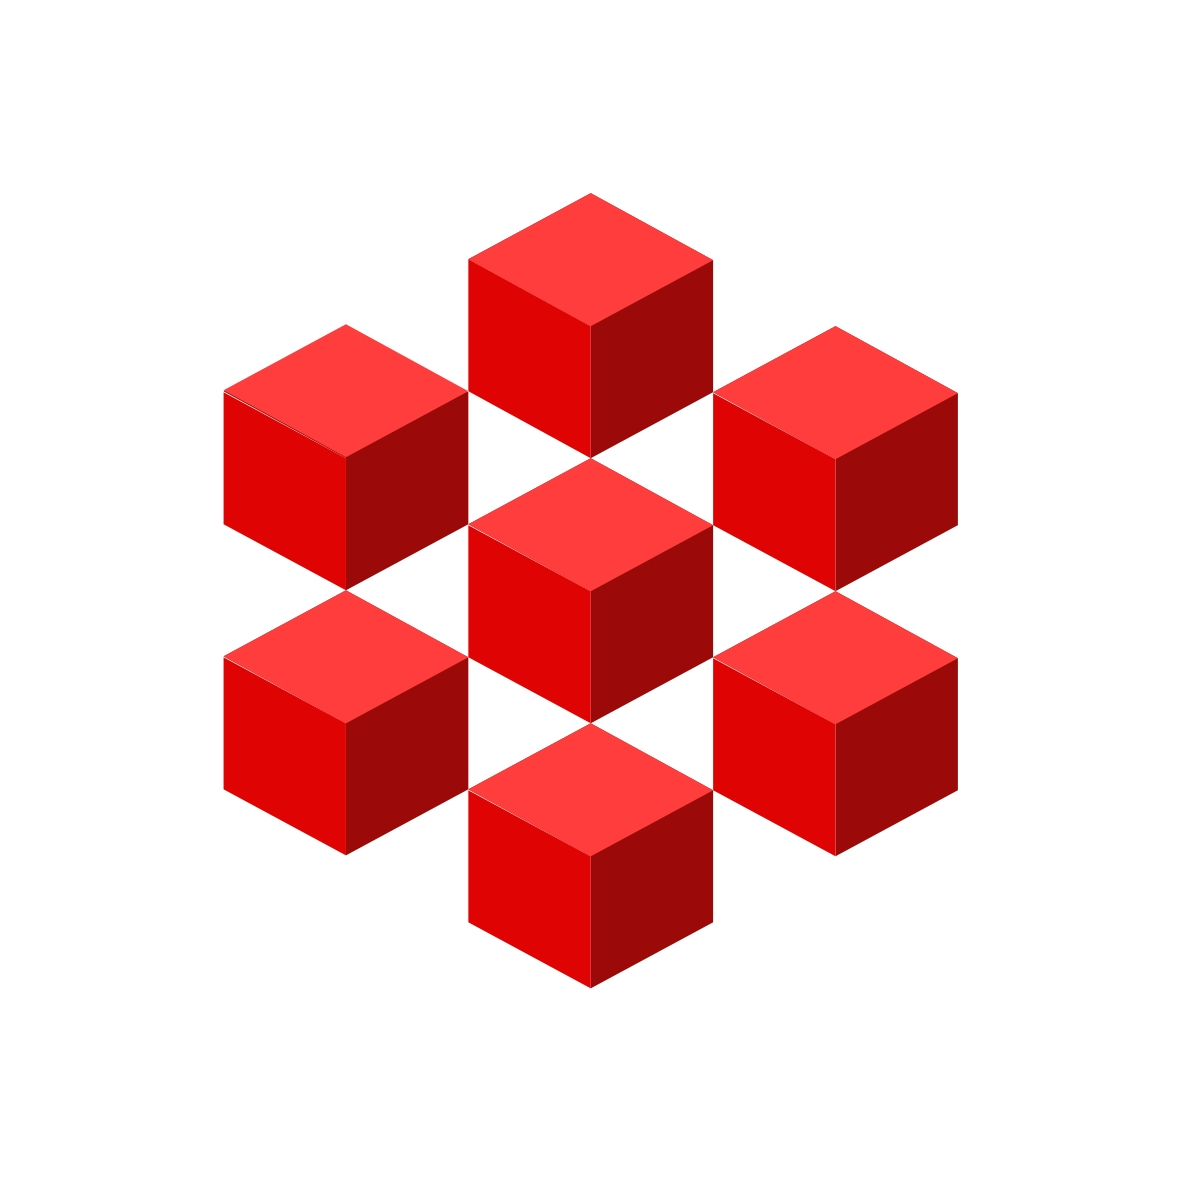 Логотип для компании по реализации упаковки из гофрокартона фото f_7425cdba64039ae7.jpg